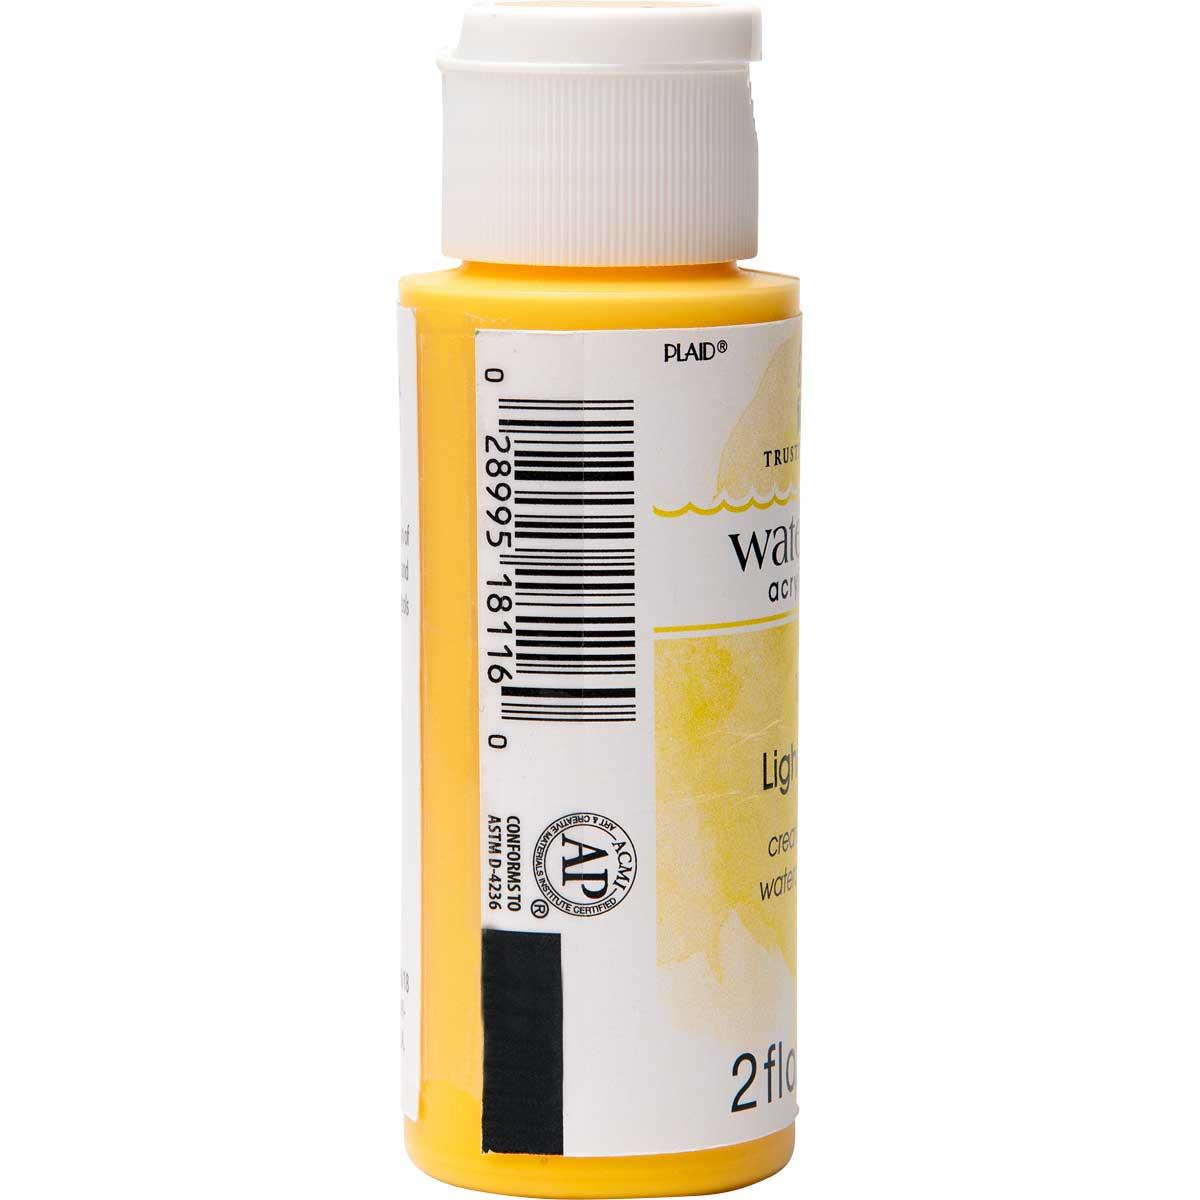 FolkArt ® Watercolor Acrylic Paint™ - Light Yellow, 2 oz.